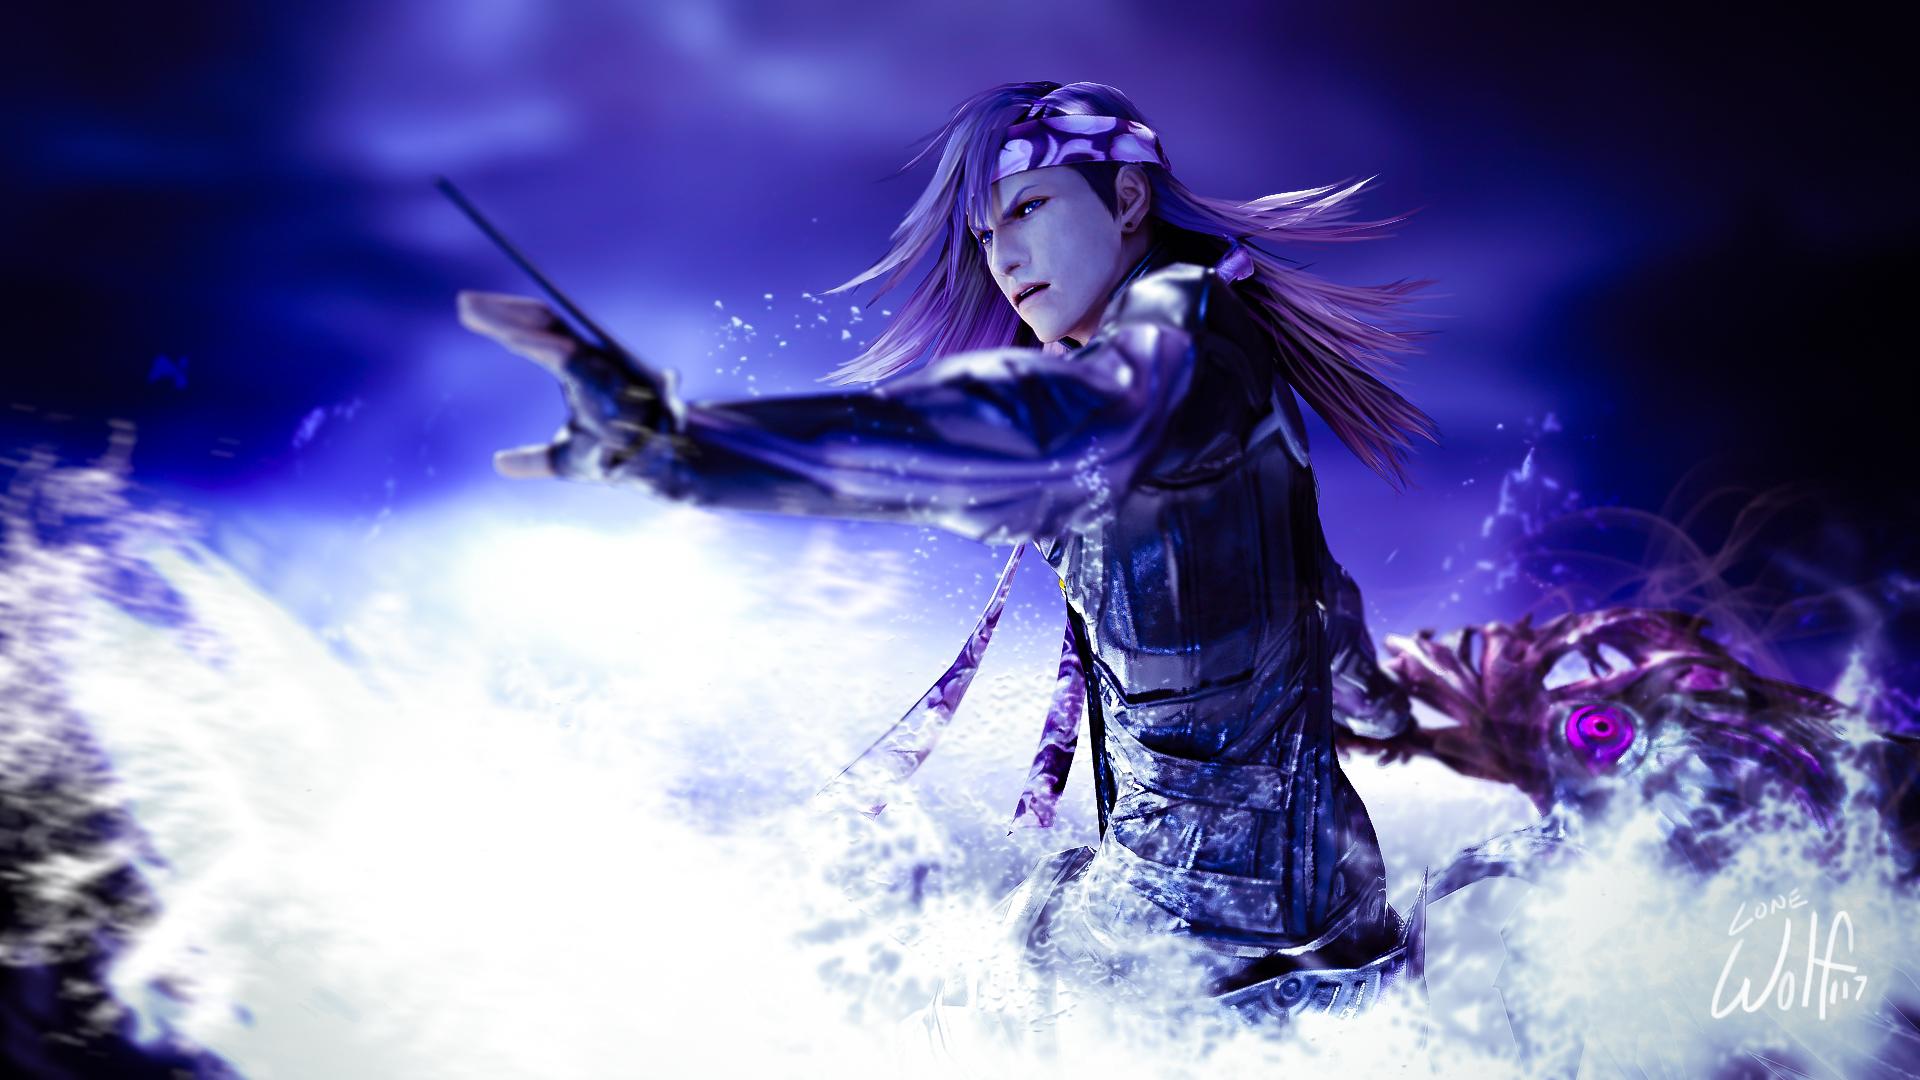 Final fantasy caius and lightning